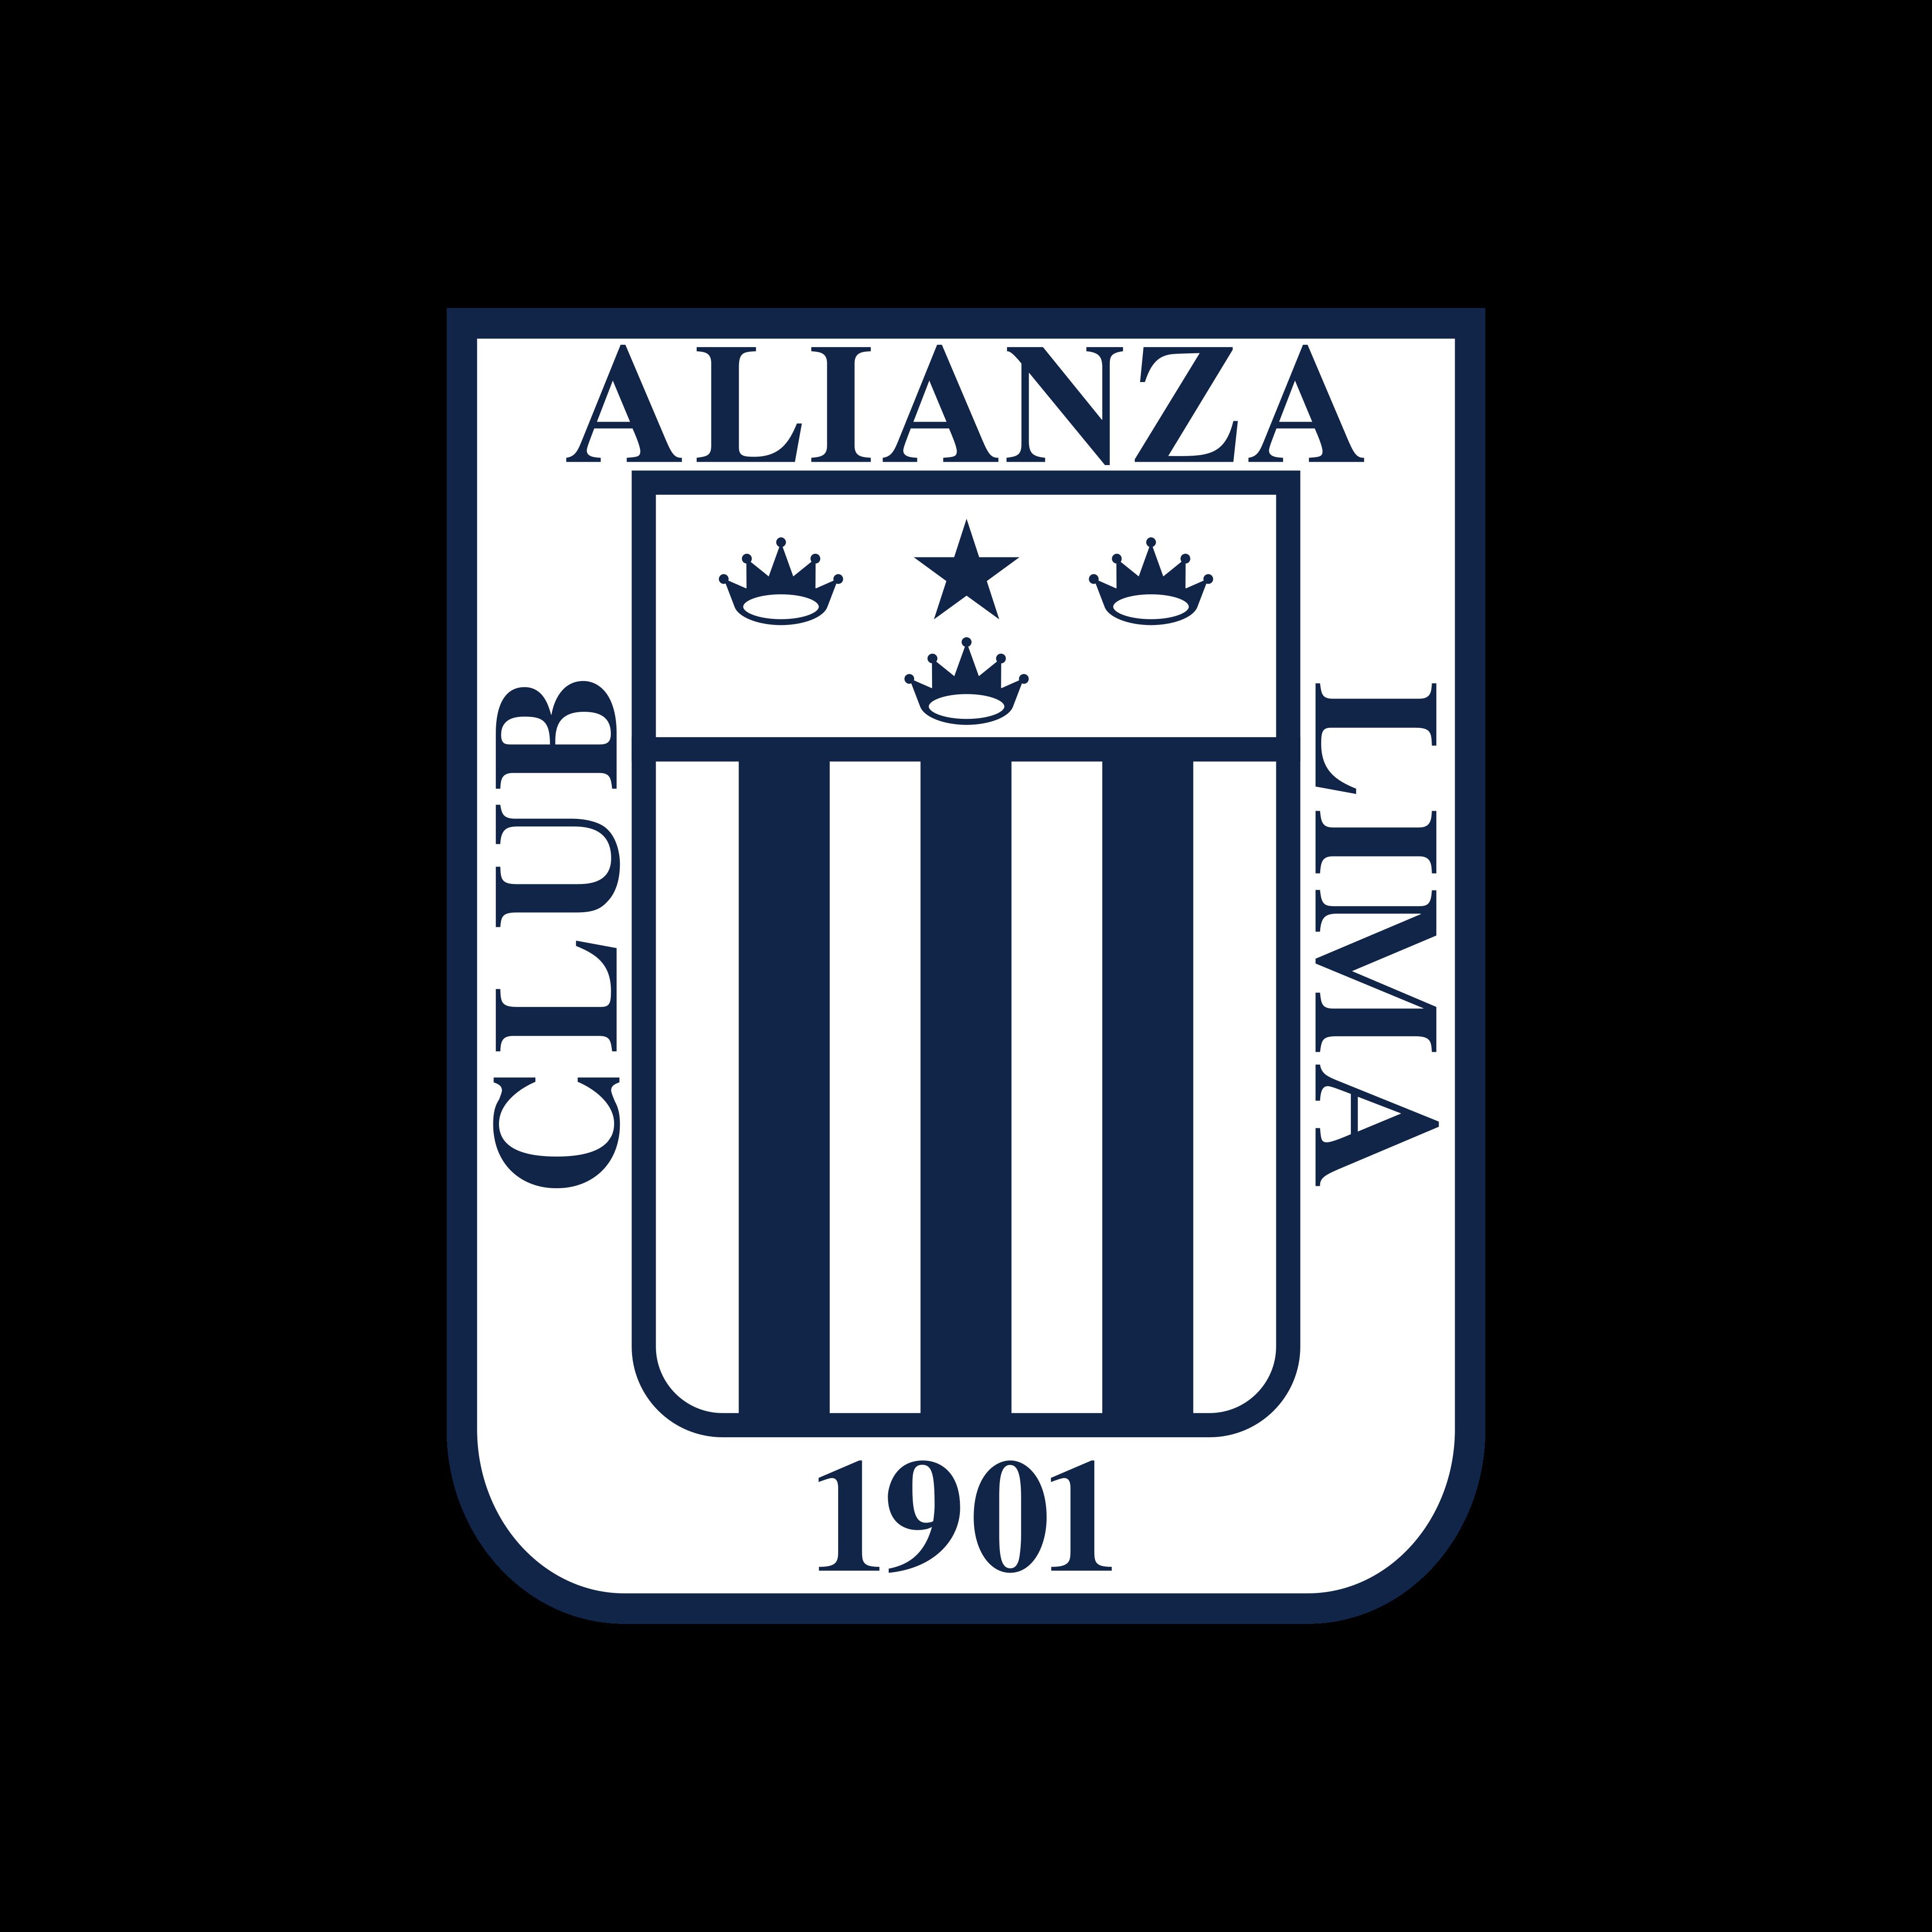 alianza lima logo escudo 0 - Alianza Lima Logo - Escudo